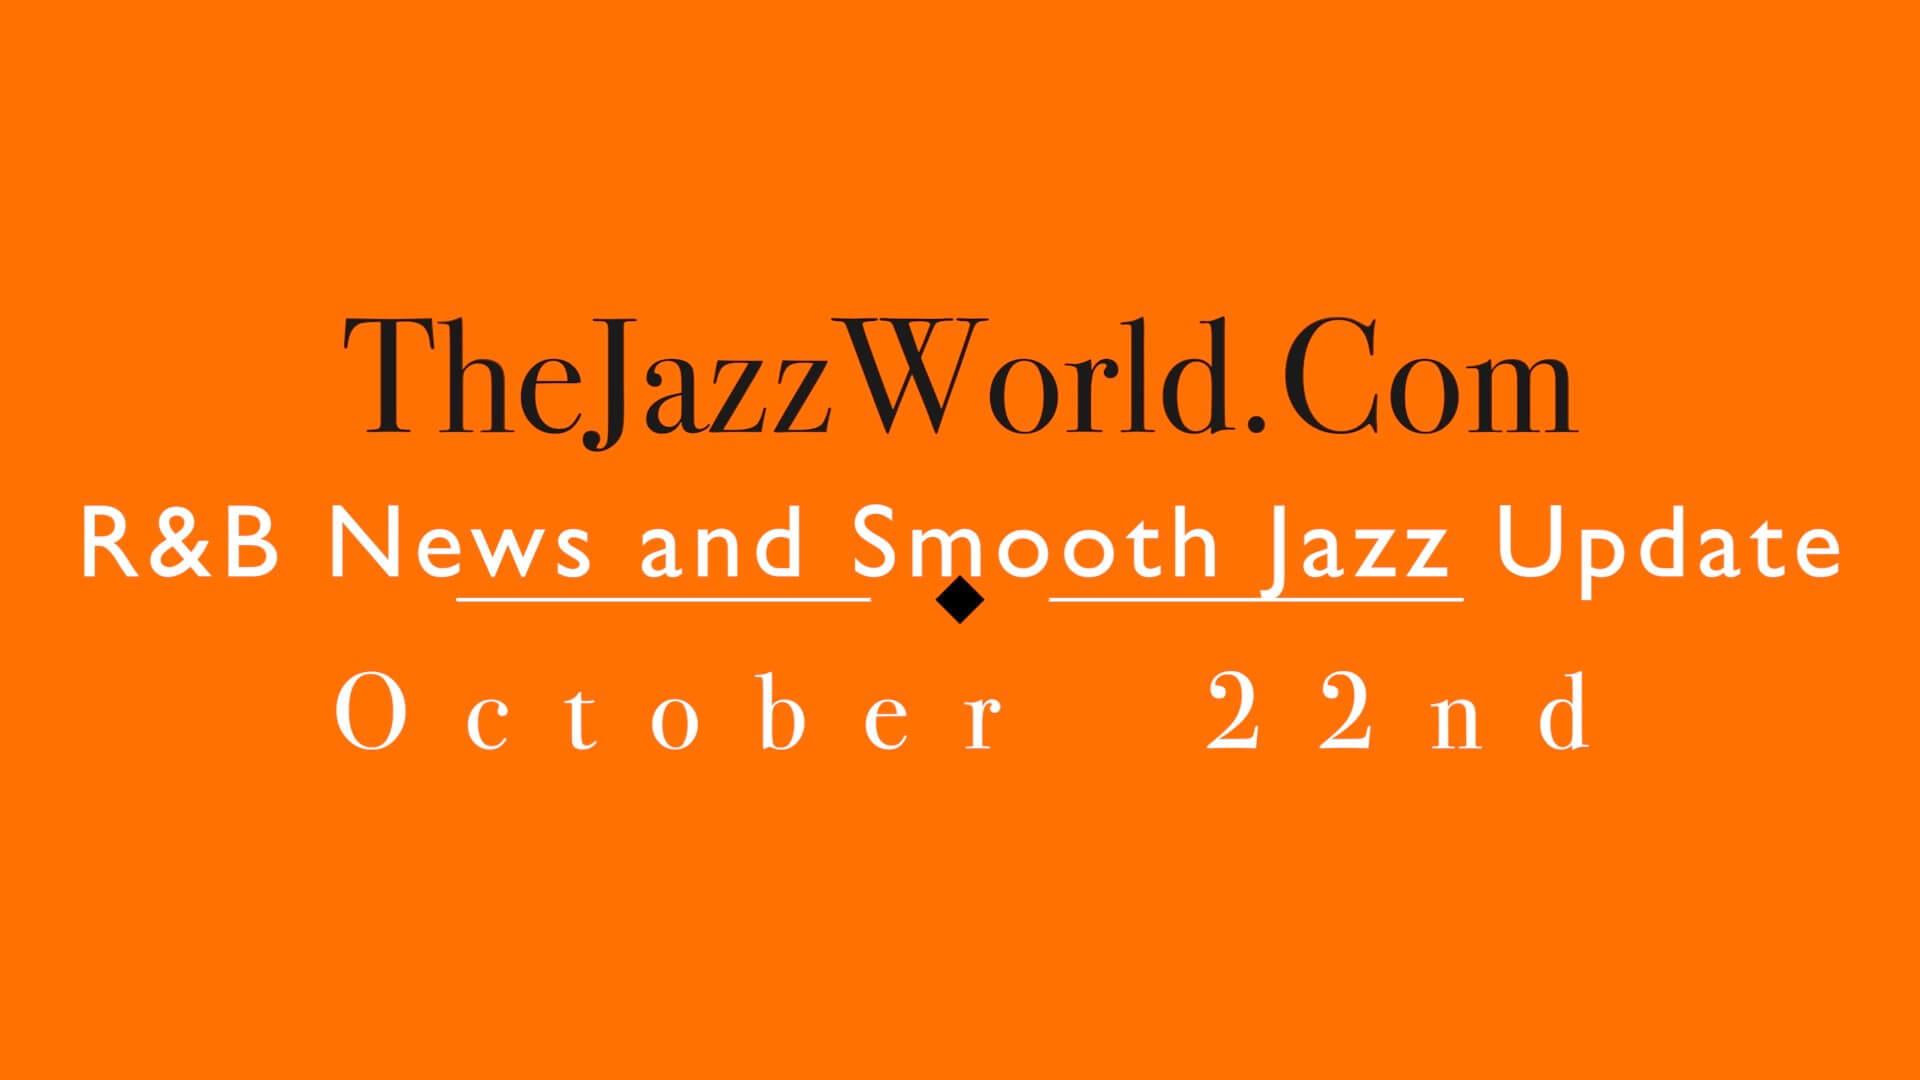 The Jazz World Show 10:22